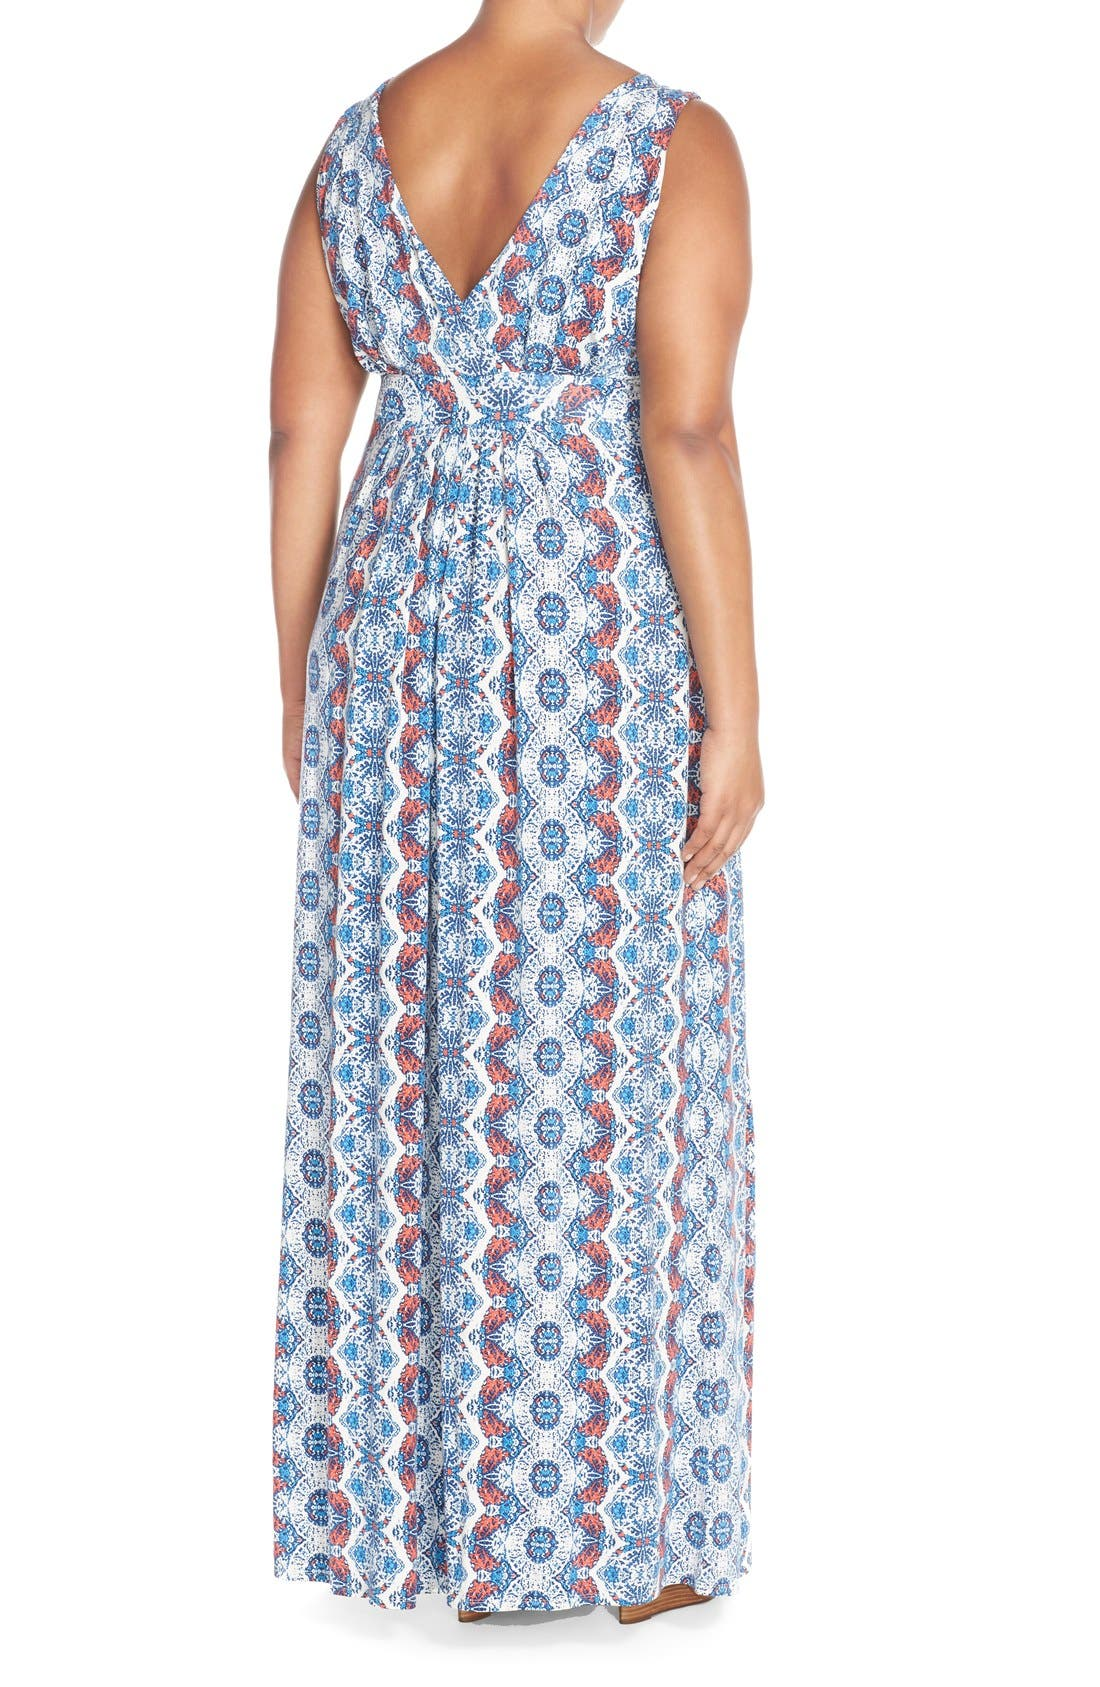 Chloe Empire Waist Maxi Dress,                             Alternate thumbnail 81, color,